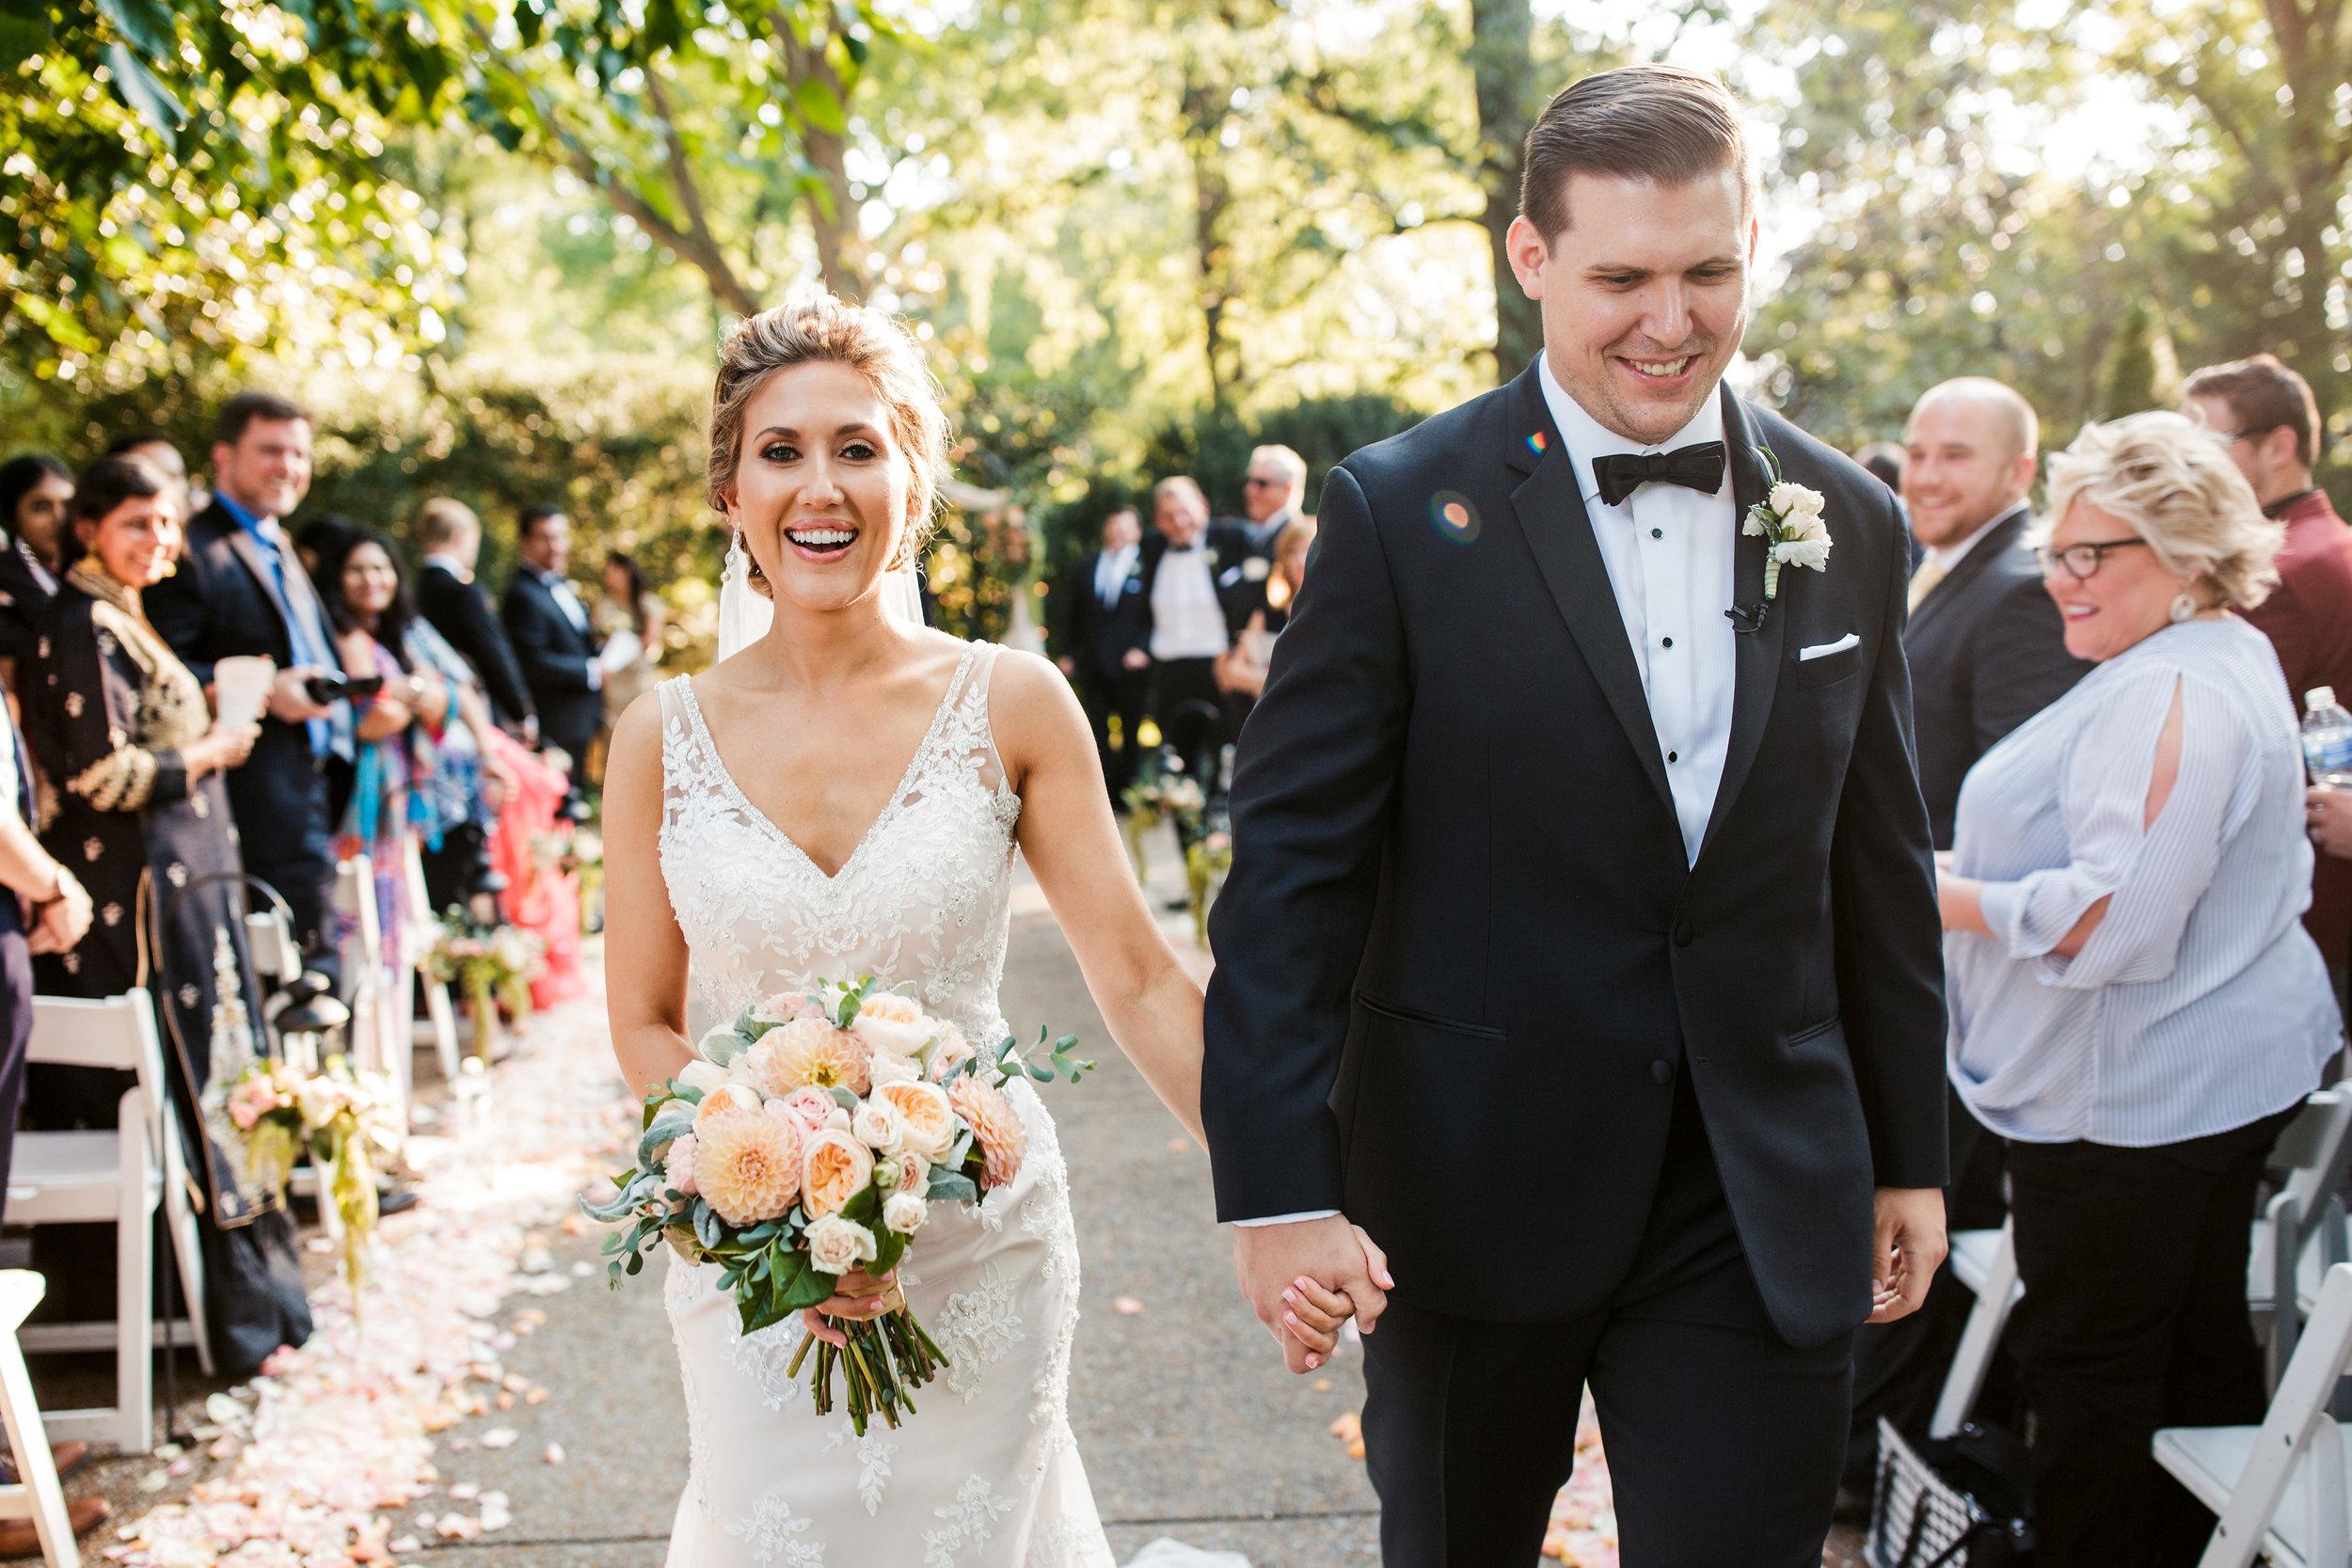 Riverwood-Mansion-Wedding16.jpg